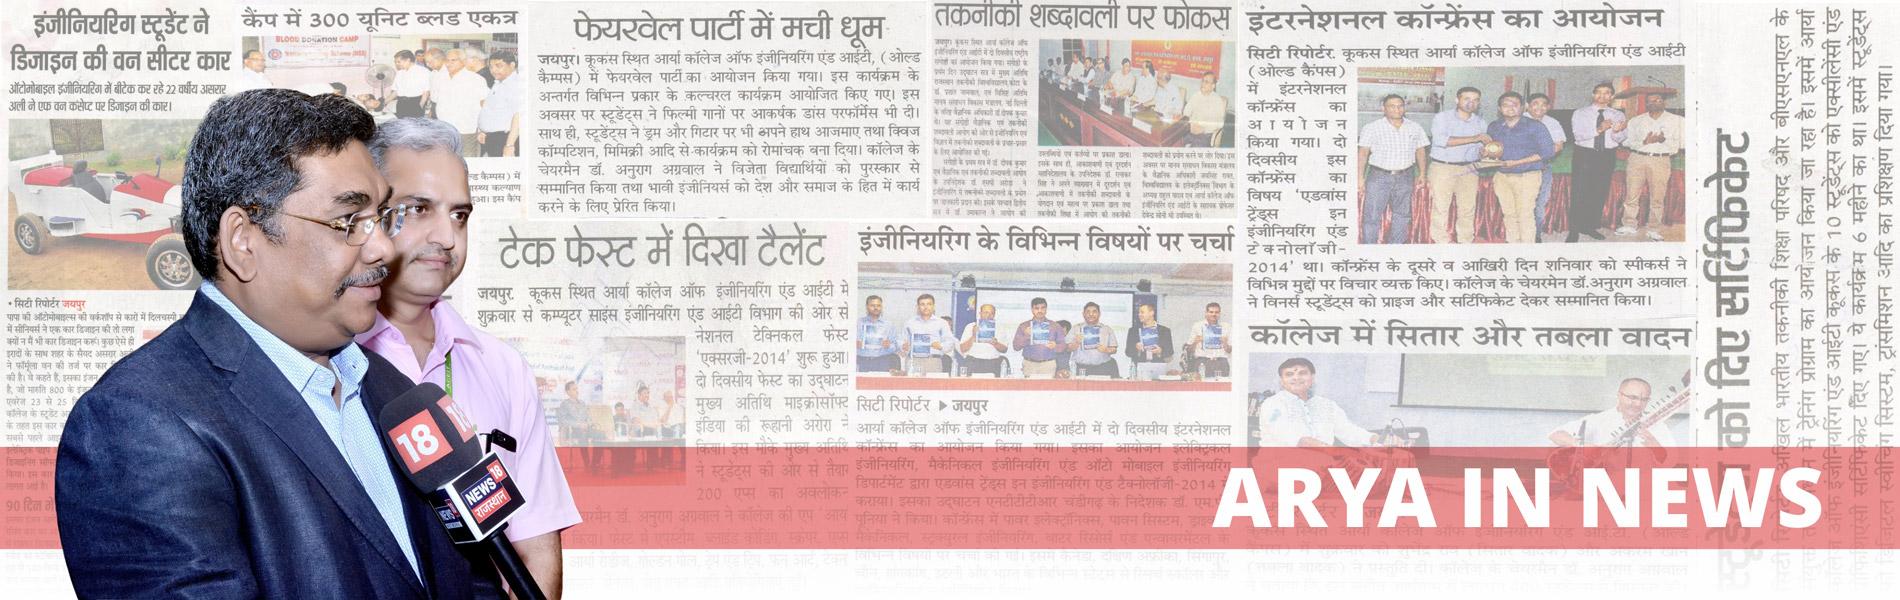 NEWS Details of Arya College Jaipur